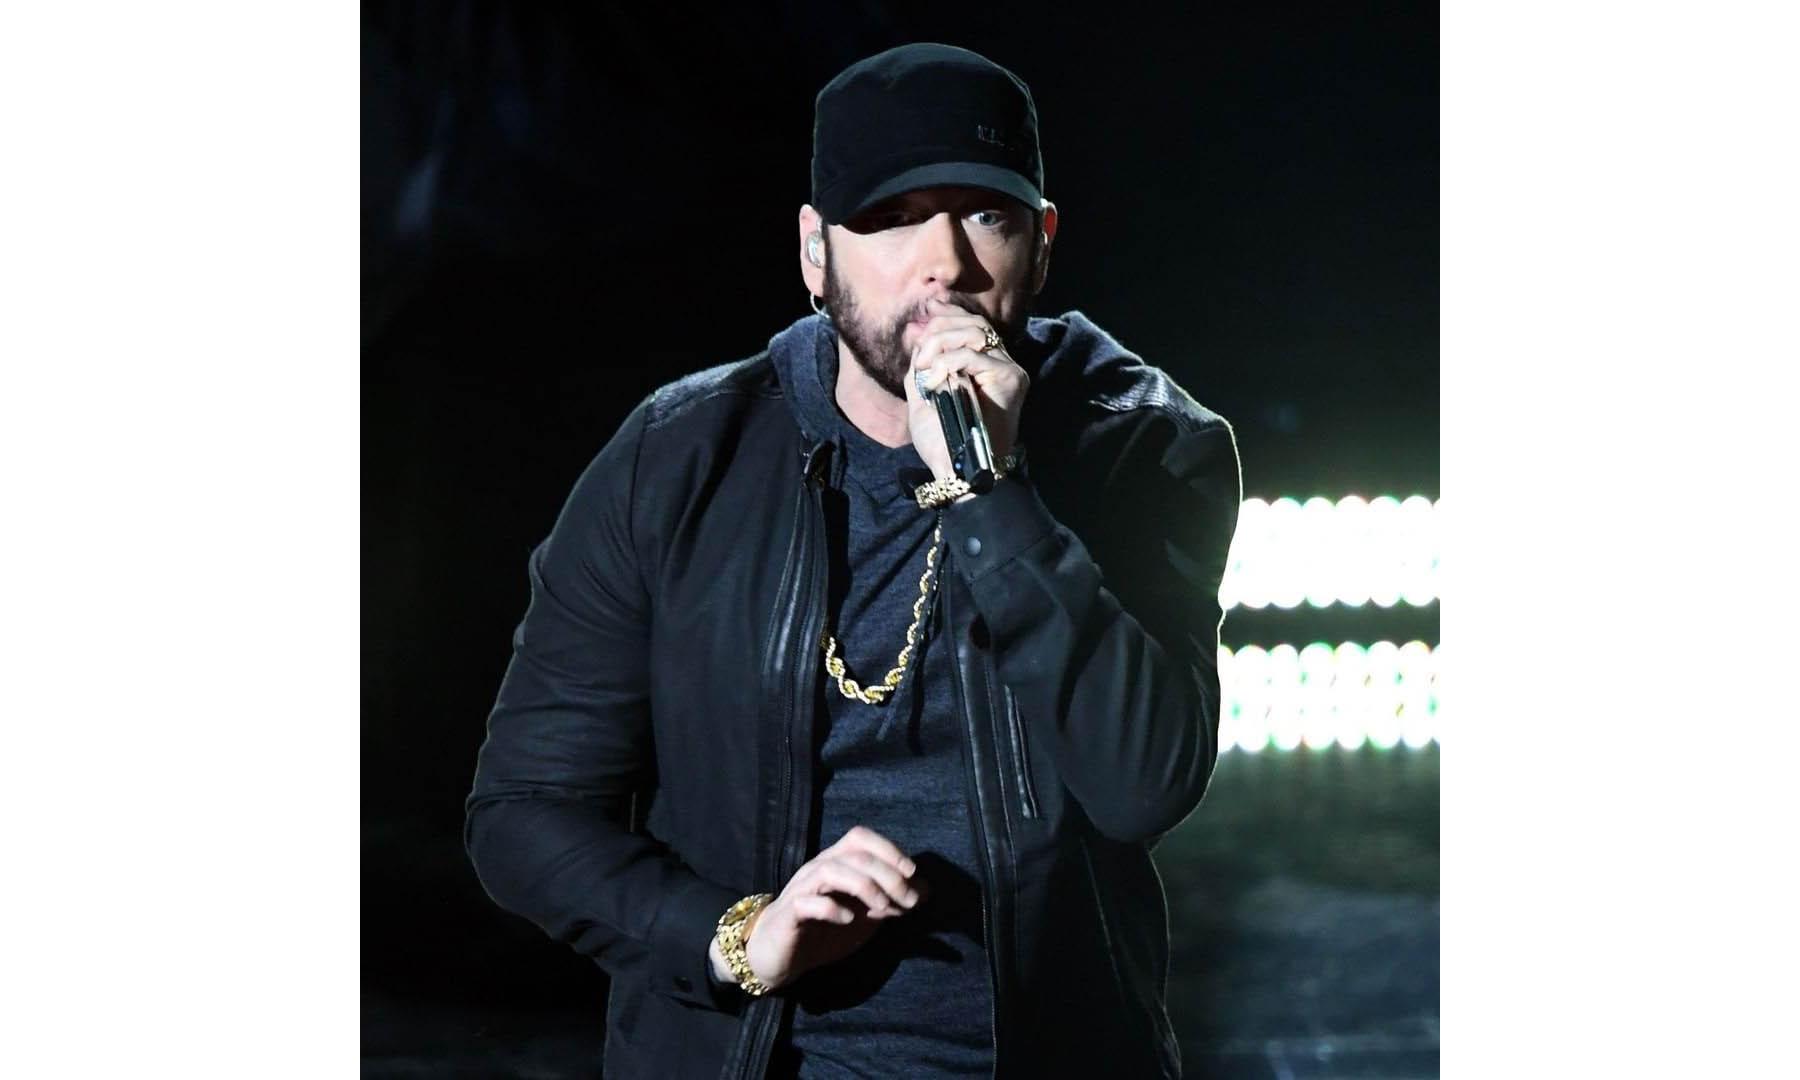 时隔 17 年,Eminem 登上奥斯卡舞台献唱《Lose Yourself》